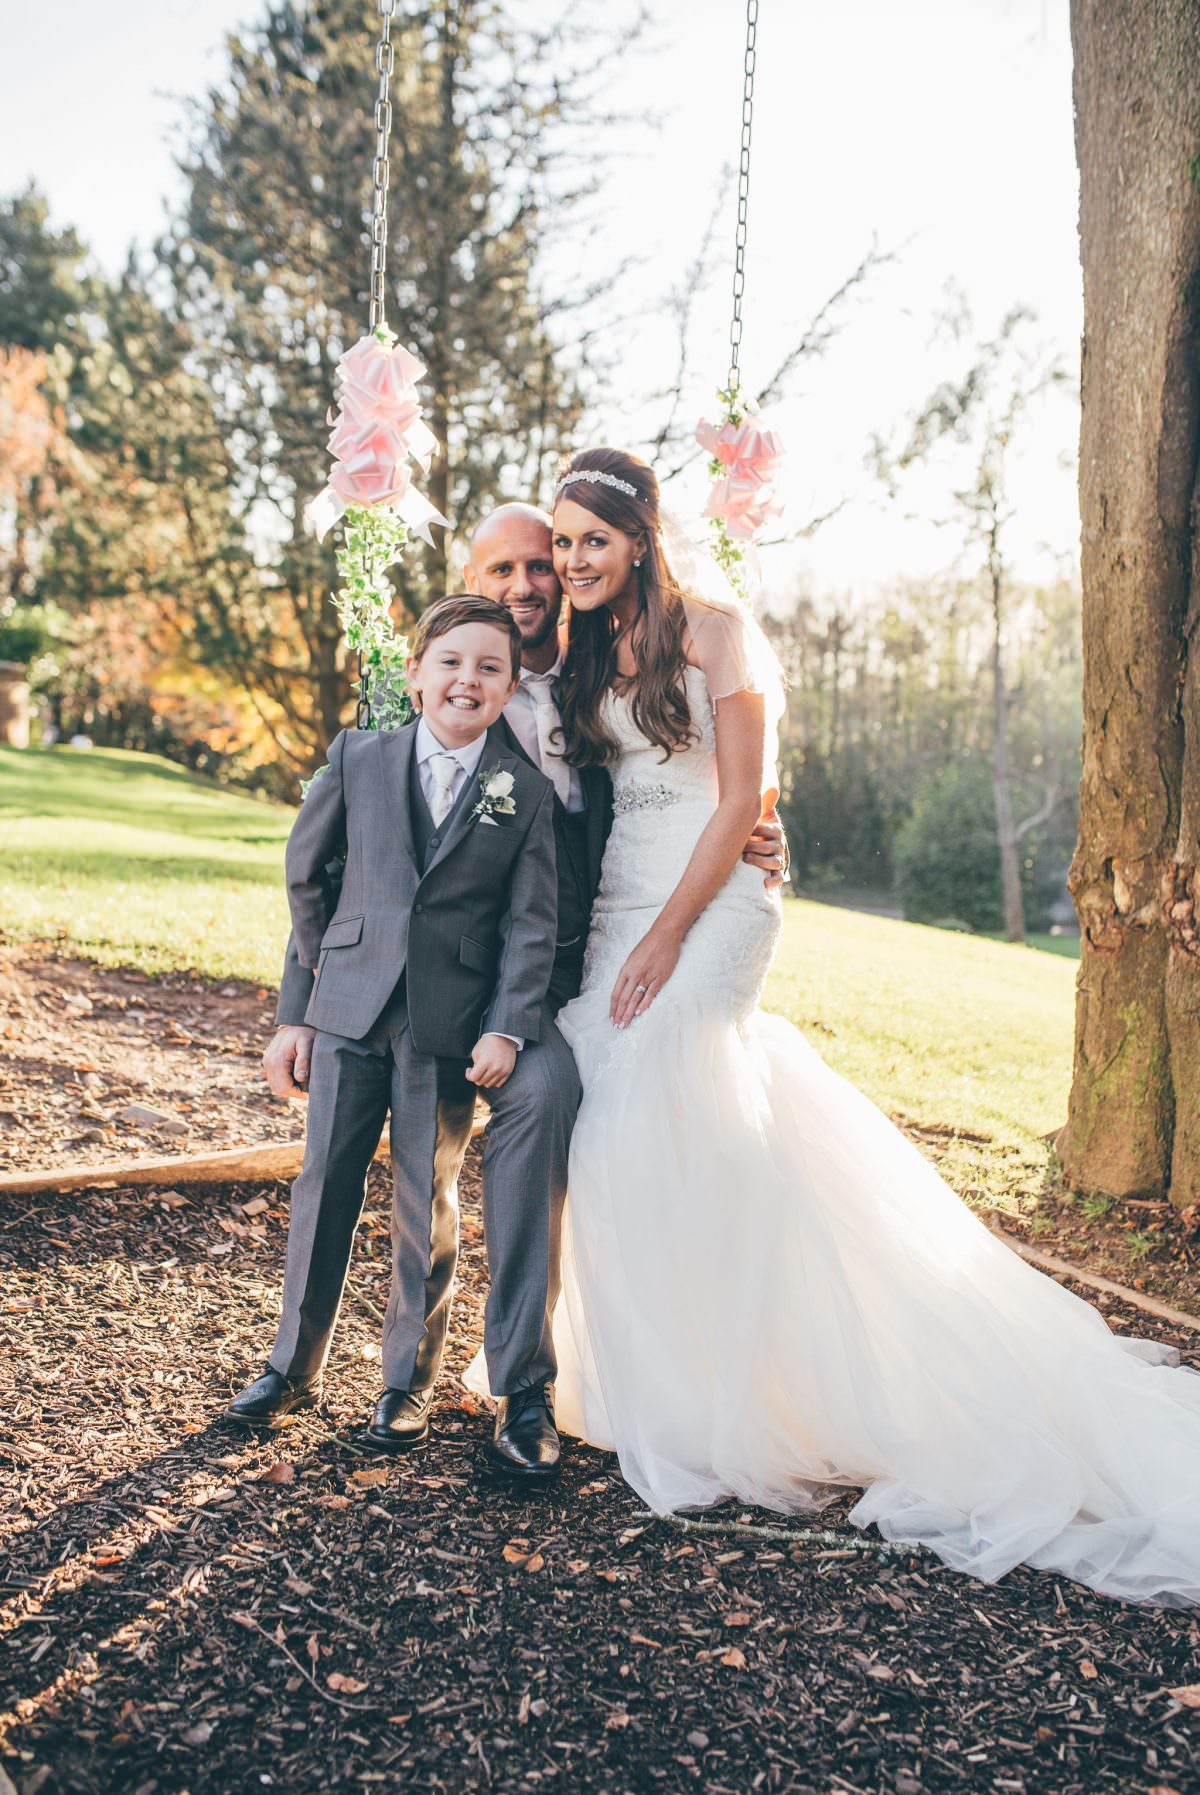 welsh_wedding_photographer_rachel_lambert_photography_decourceys_cardiff_rhiannon_gavin_ 52